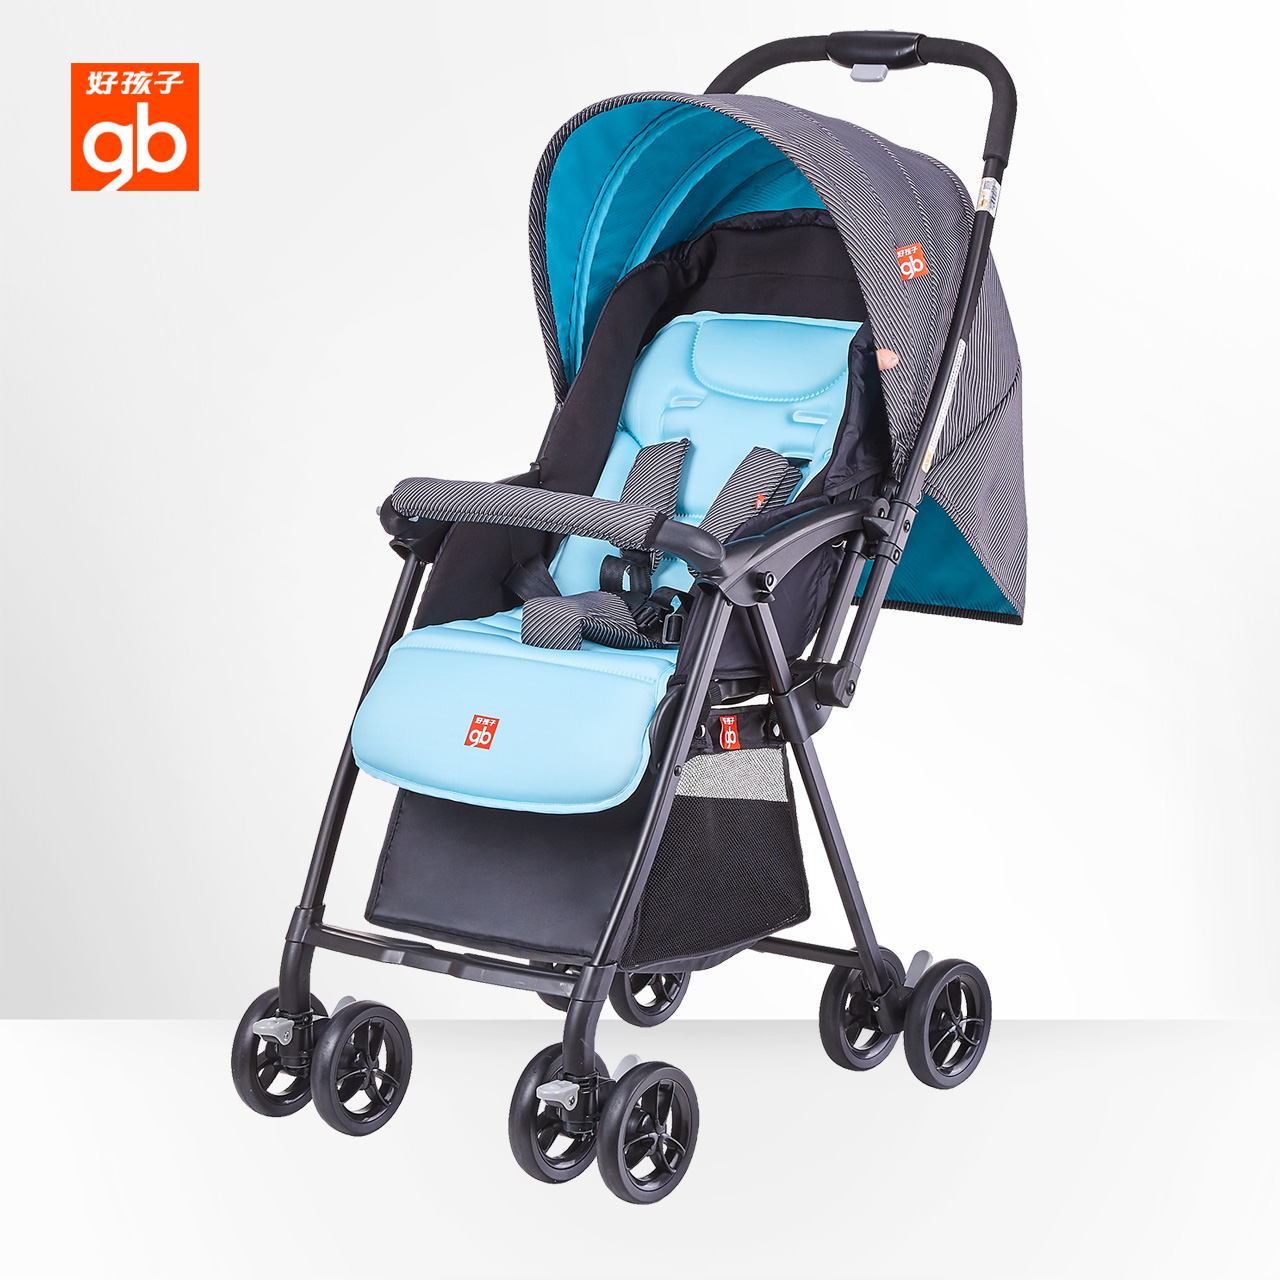 gb好孩子超輕嬰兒推車輕便傘車可坐可躺折疊便攜推車D829-A